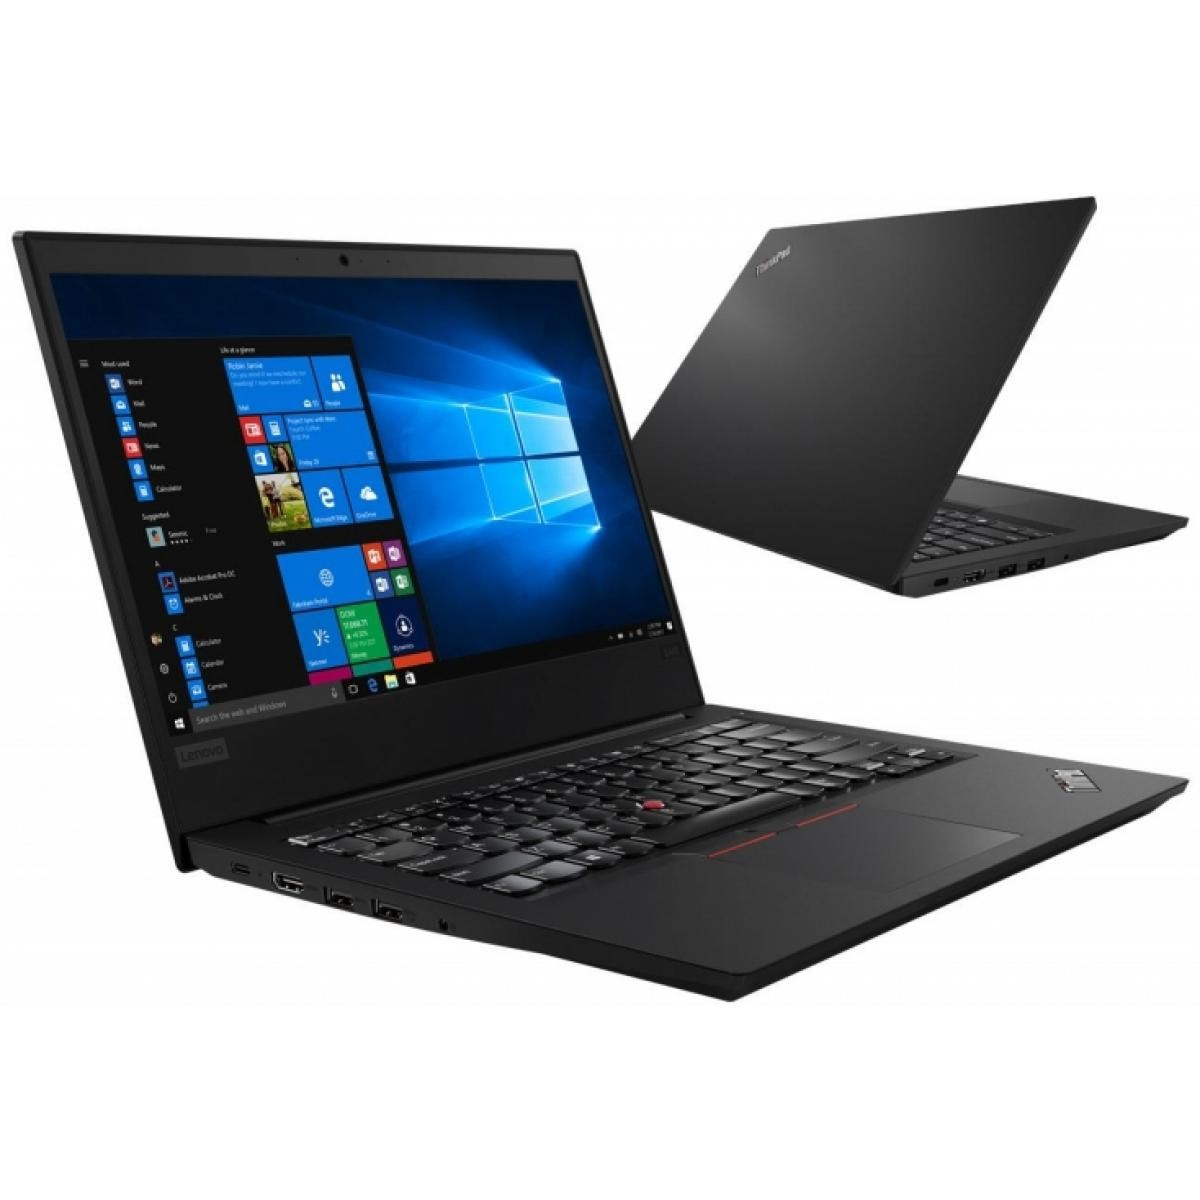 Lenovo ThinkPad E490 - 20N8S01V00